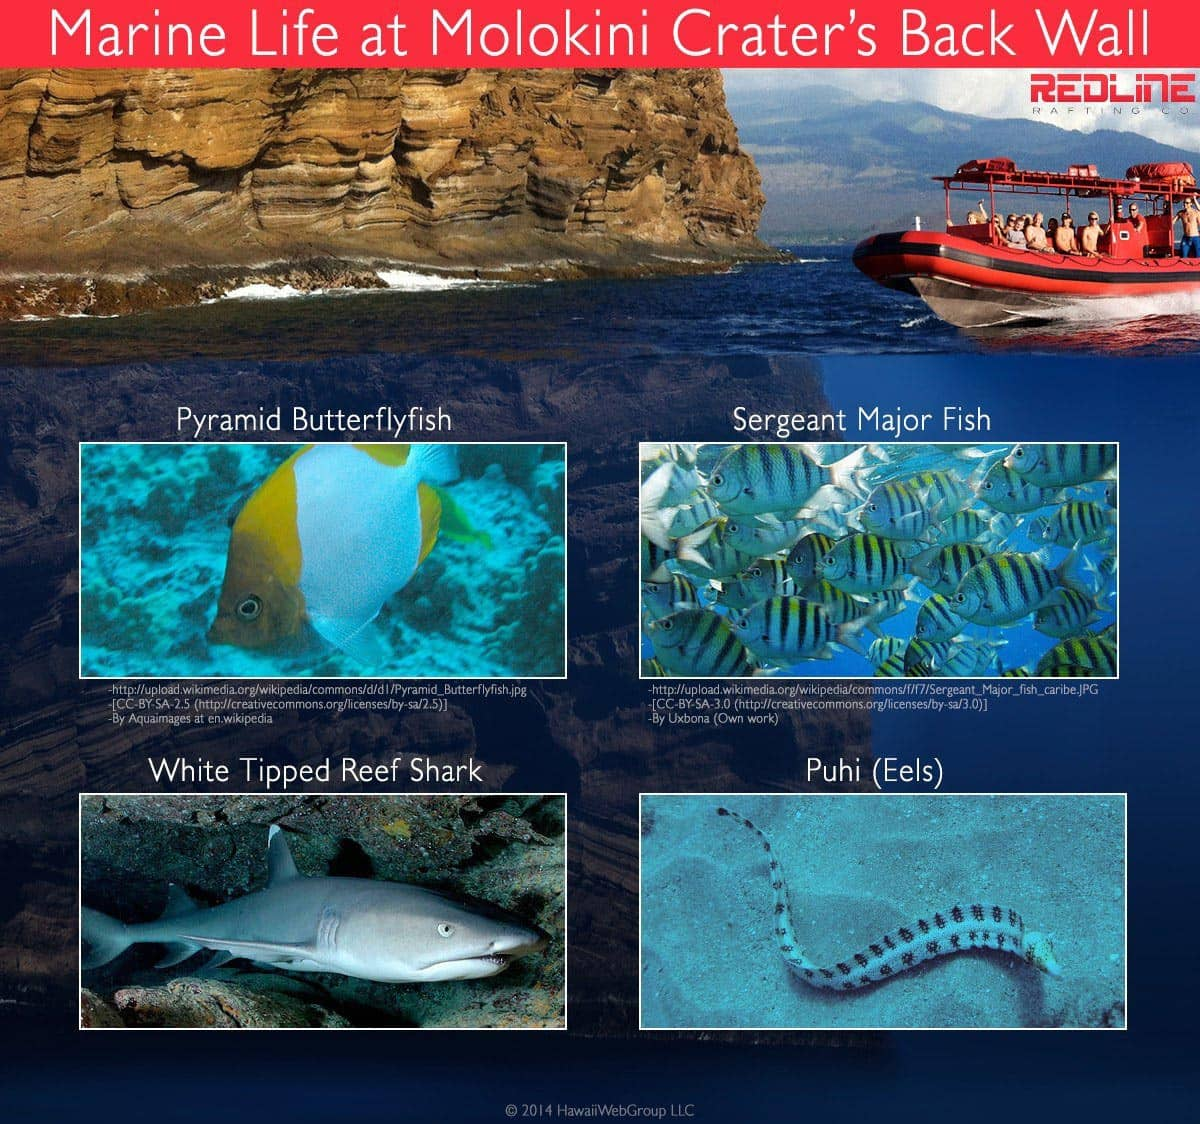 Molokini Crater Back Wall Marine Life